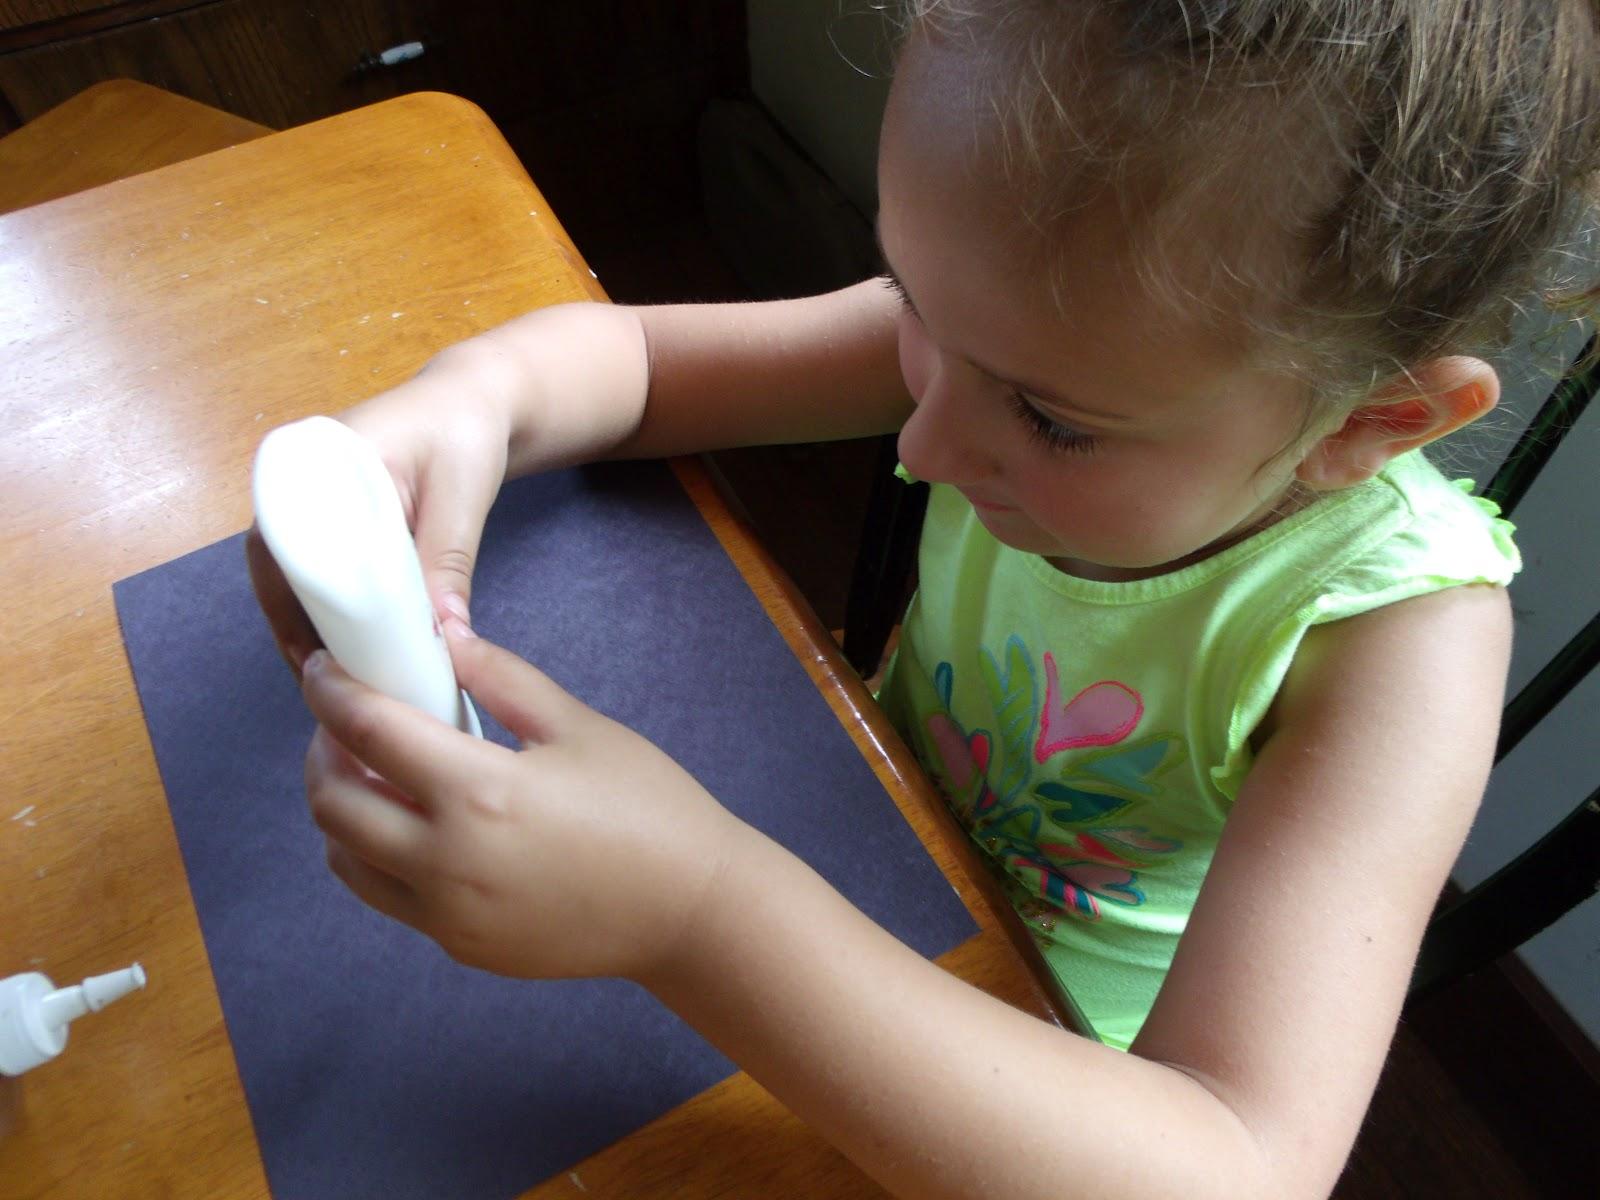 http://3.bp.blogspot.com/-U4qdfQyrkYc/T-4pXvlLCKI/AAAAAAAABIs/wYhmL_5MEs8/s1600/paper+glue.JPG